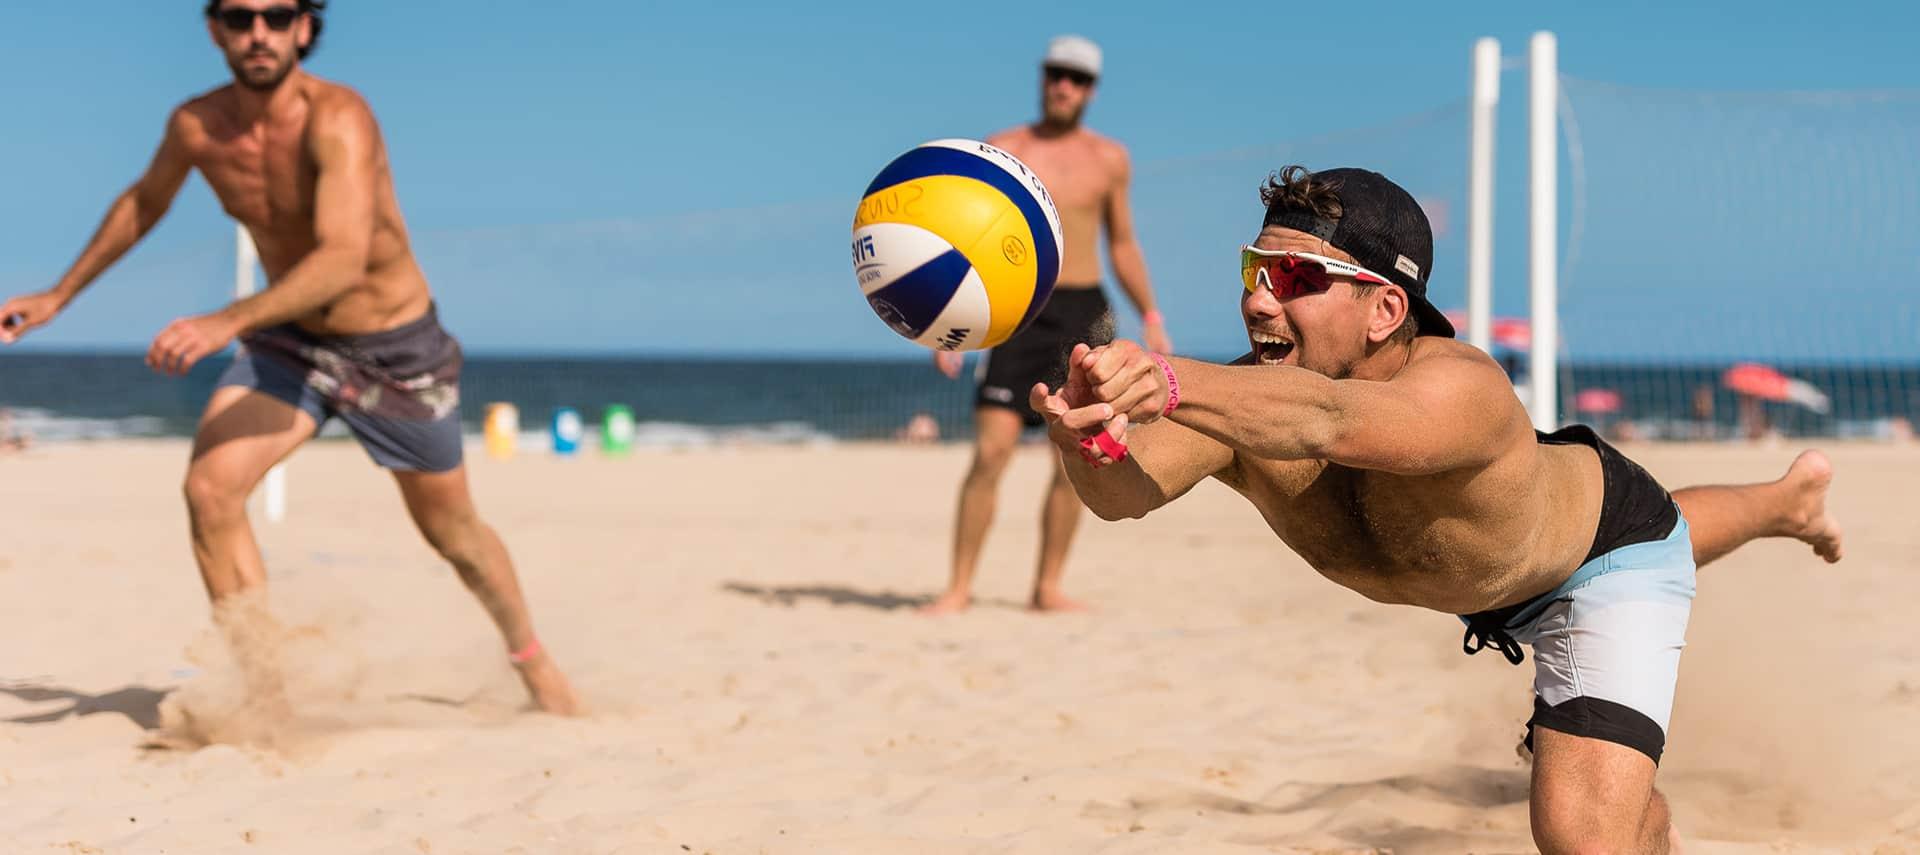 Sunsation Beach Volleyball Festival Spanien